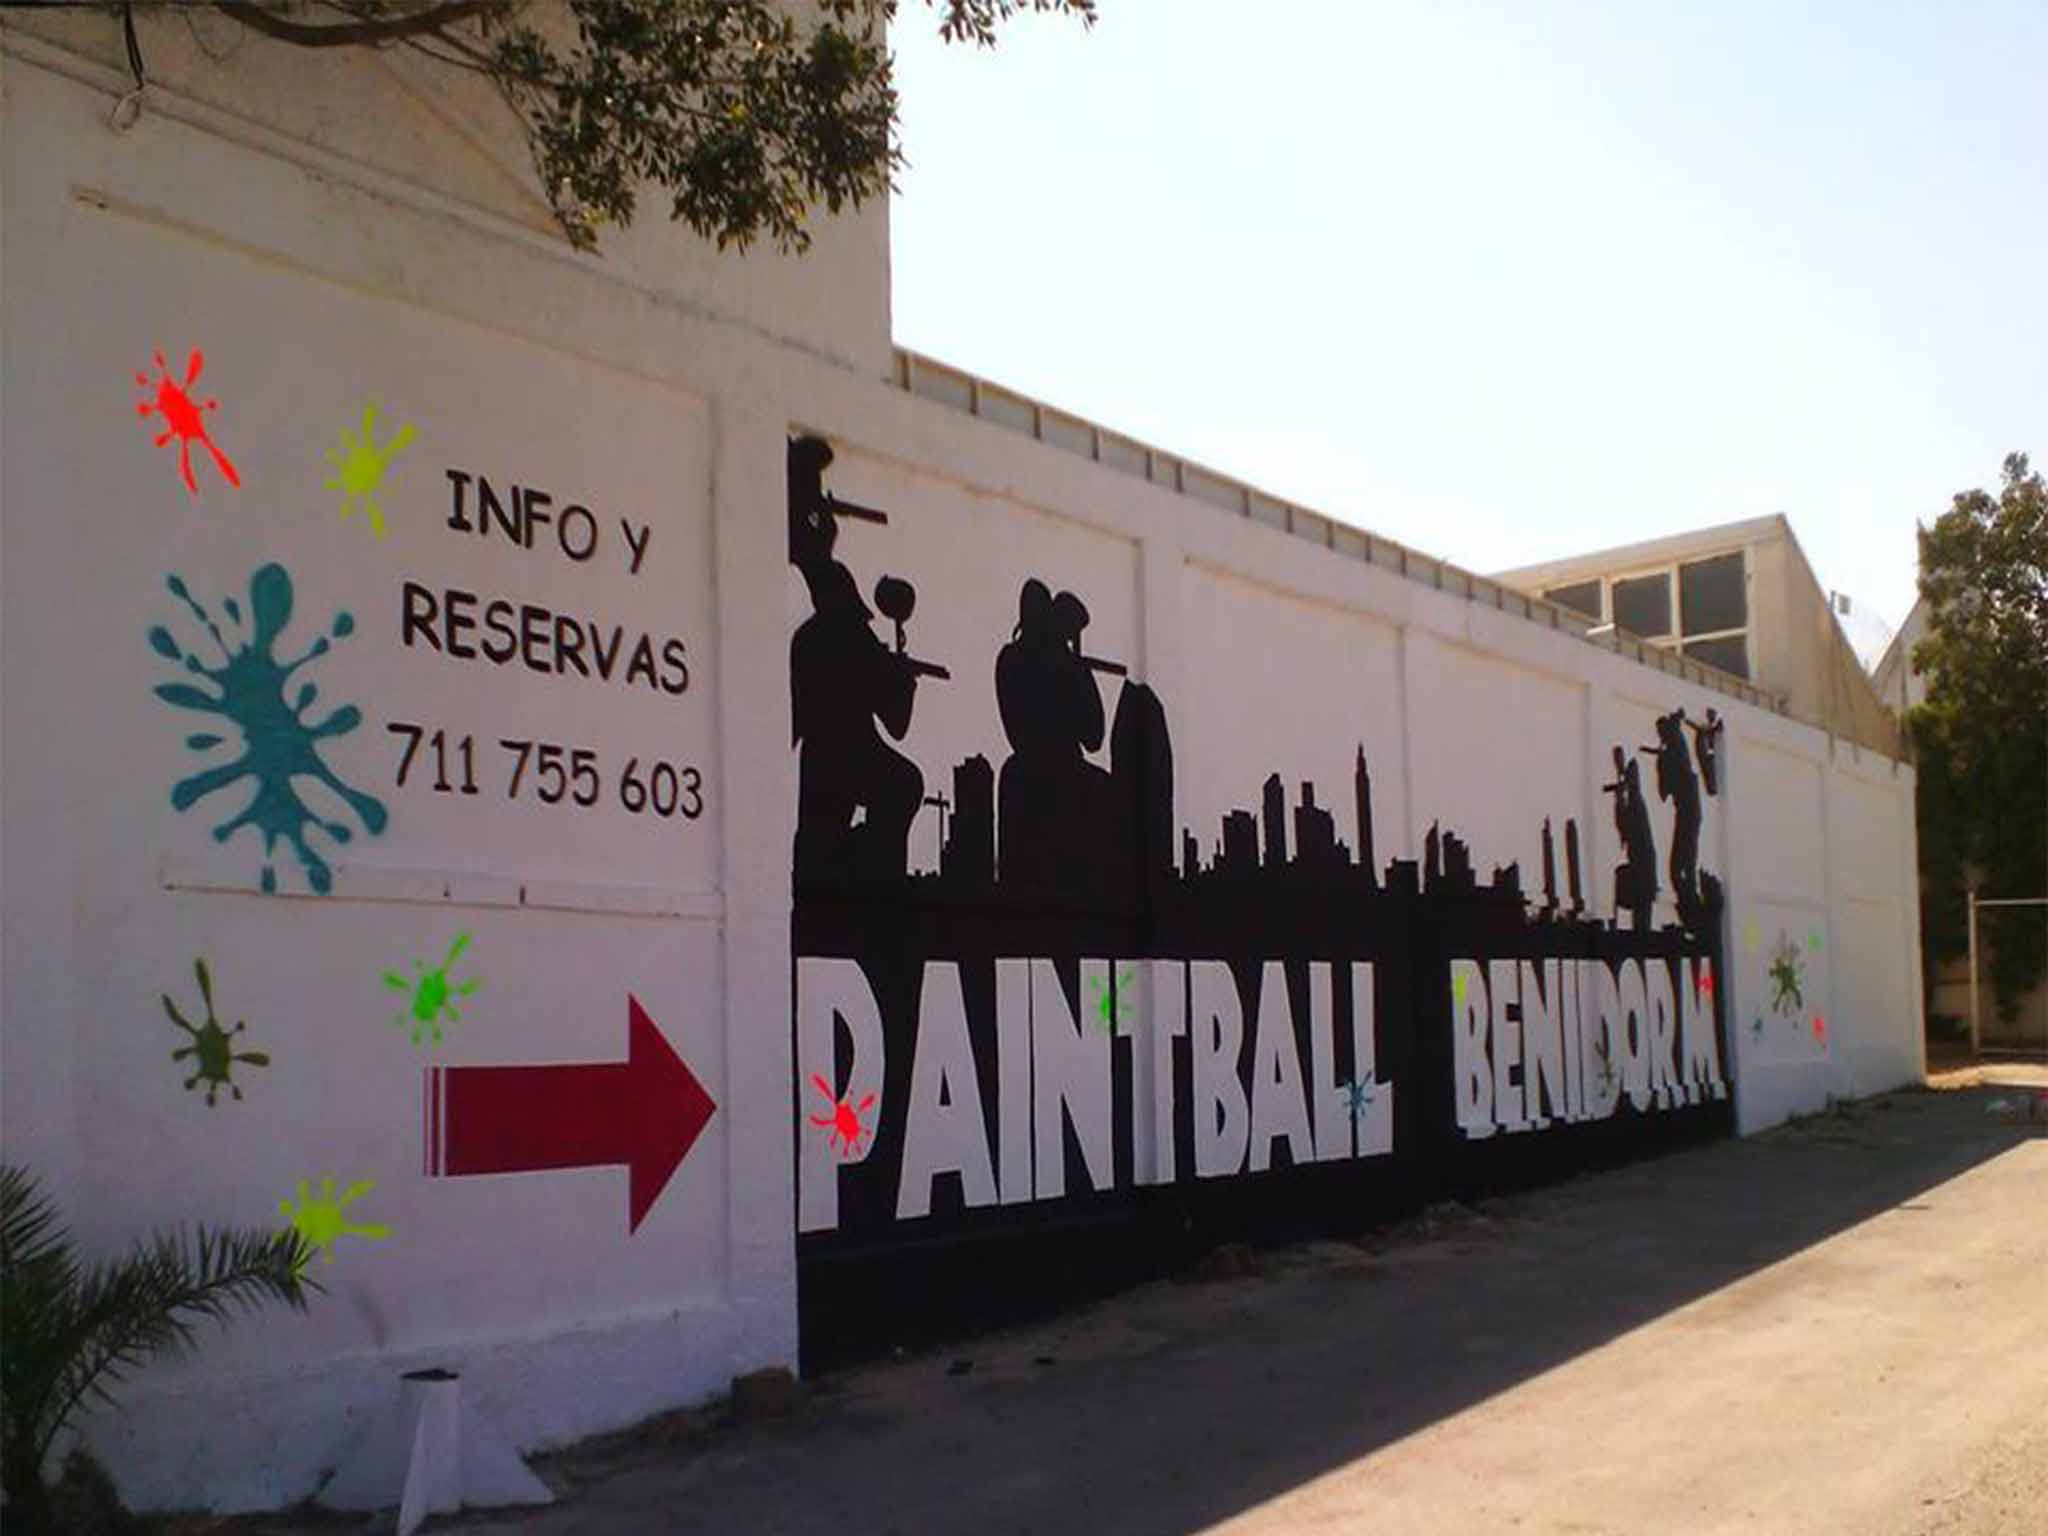 Paintball Benidorm